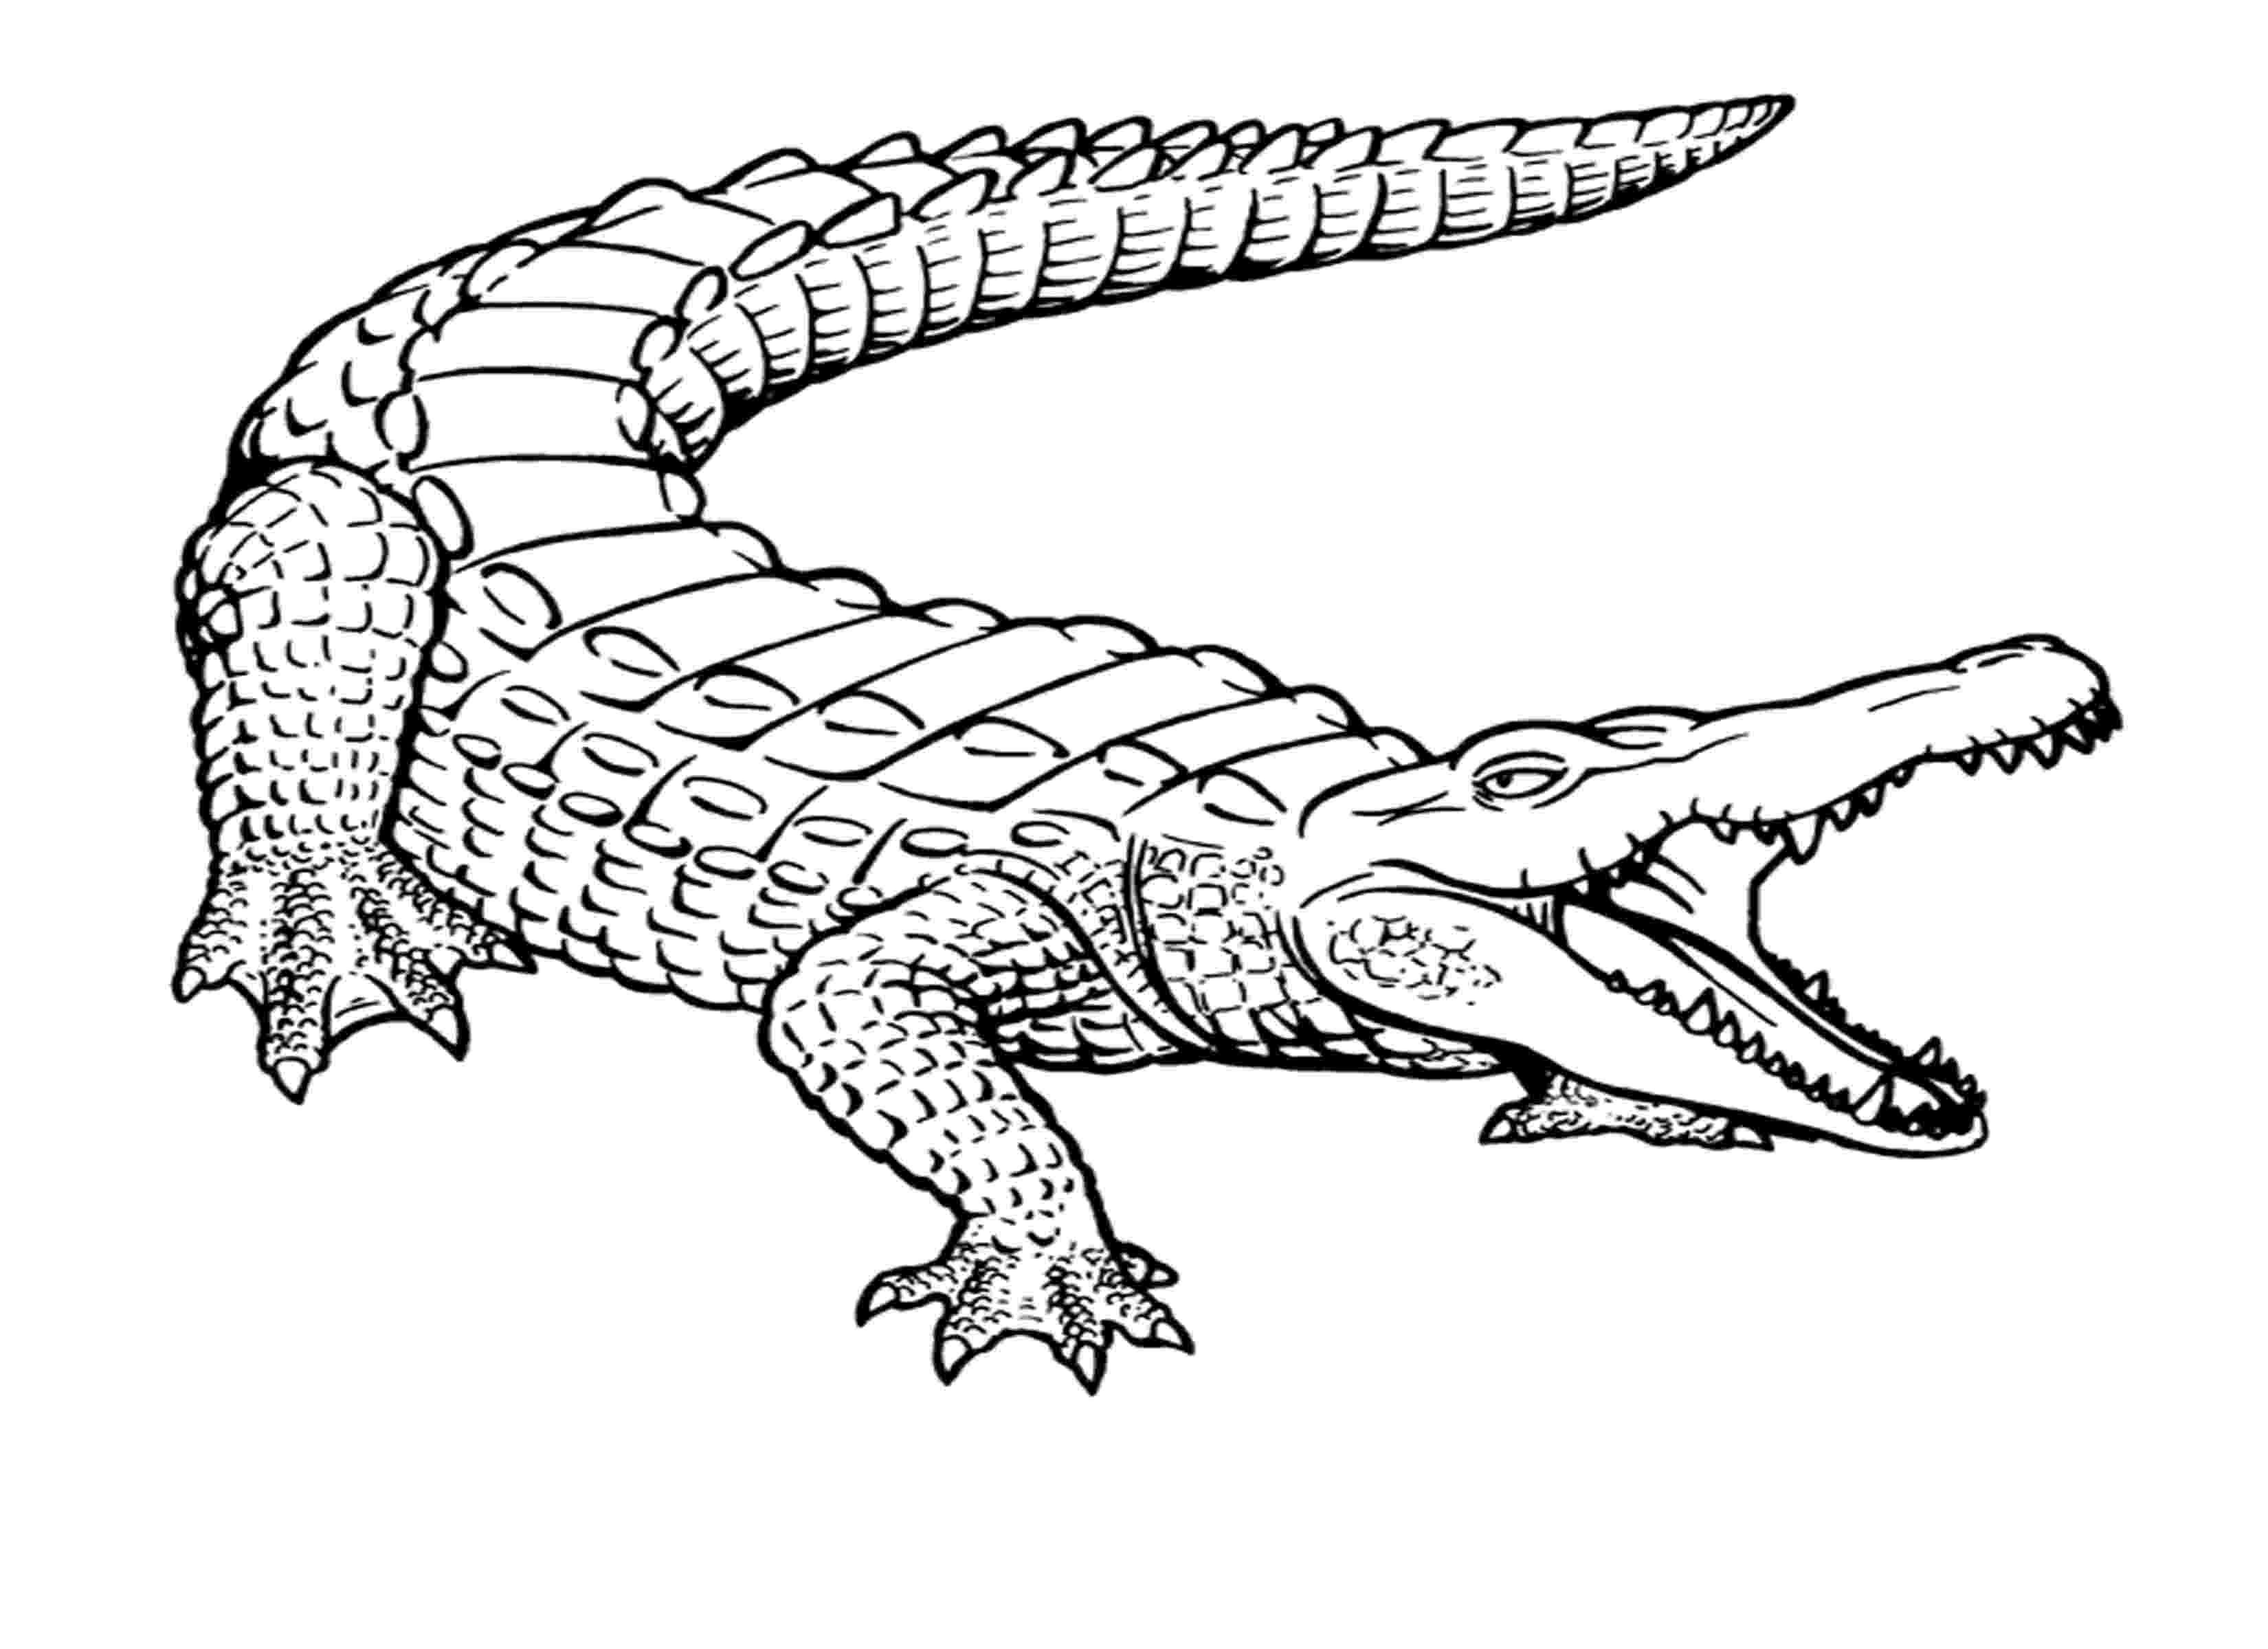 crocodile pictures to colour free printable crocodile coloring pages for kids colour to pictures crocodile